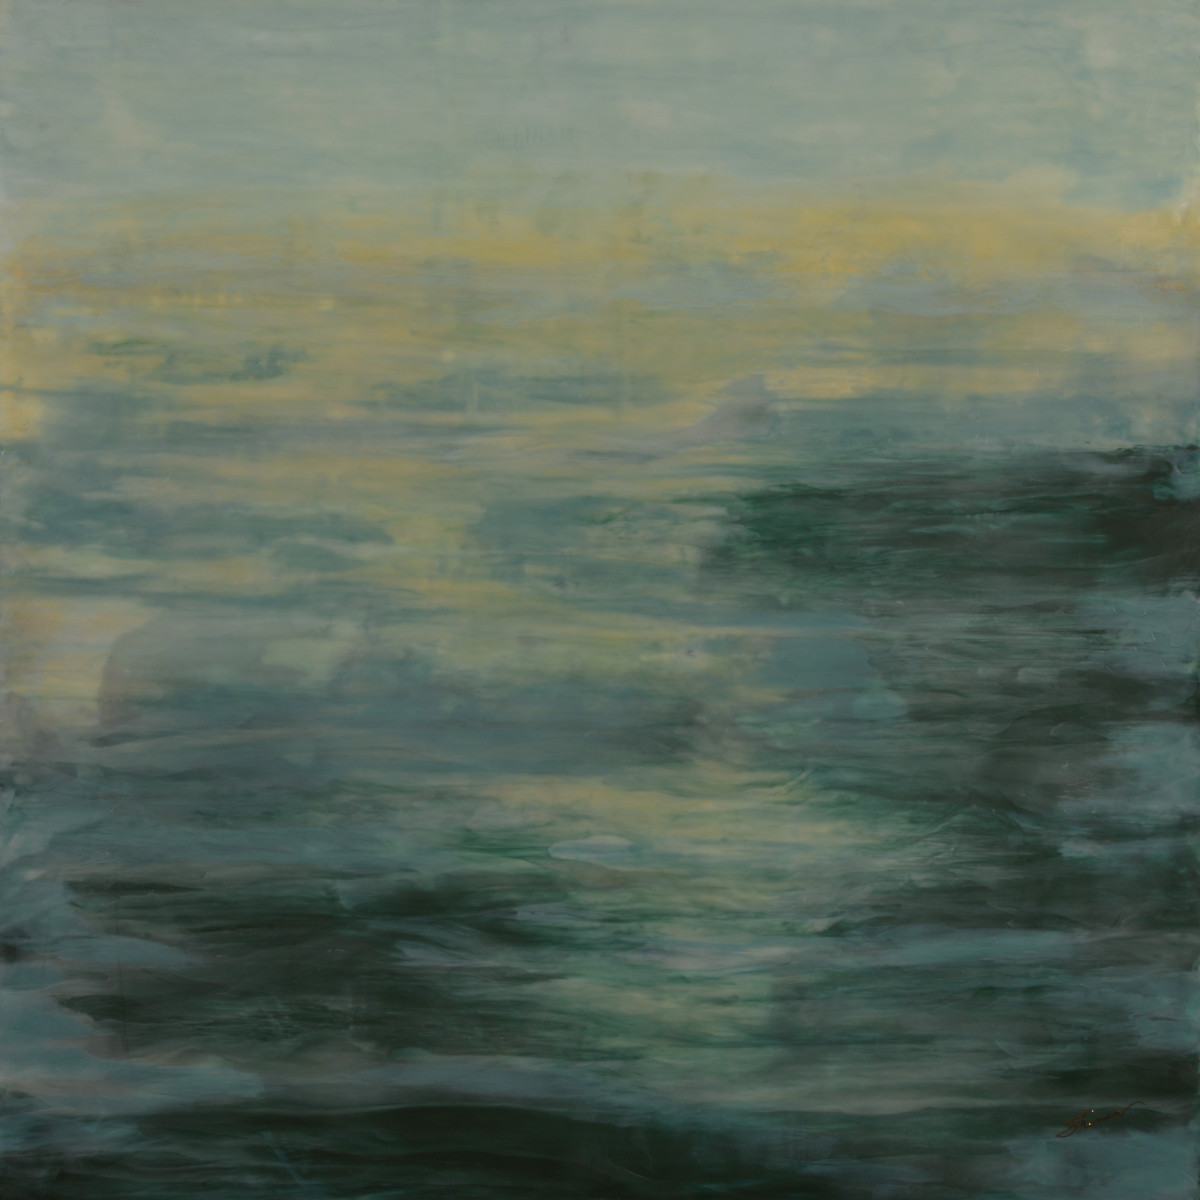 Sinking into Dusk by Shima Shanti